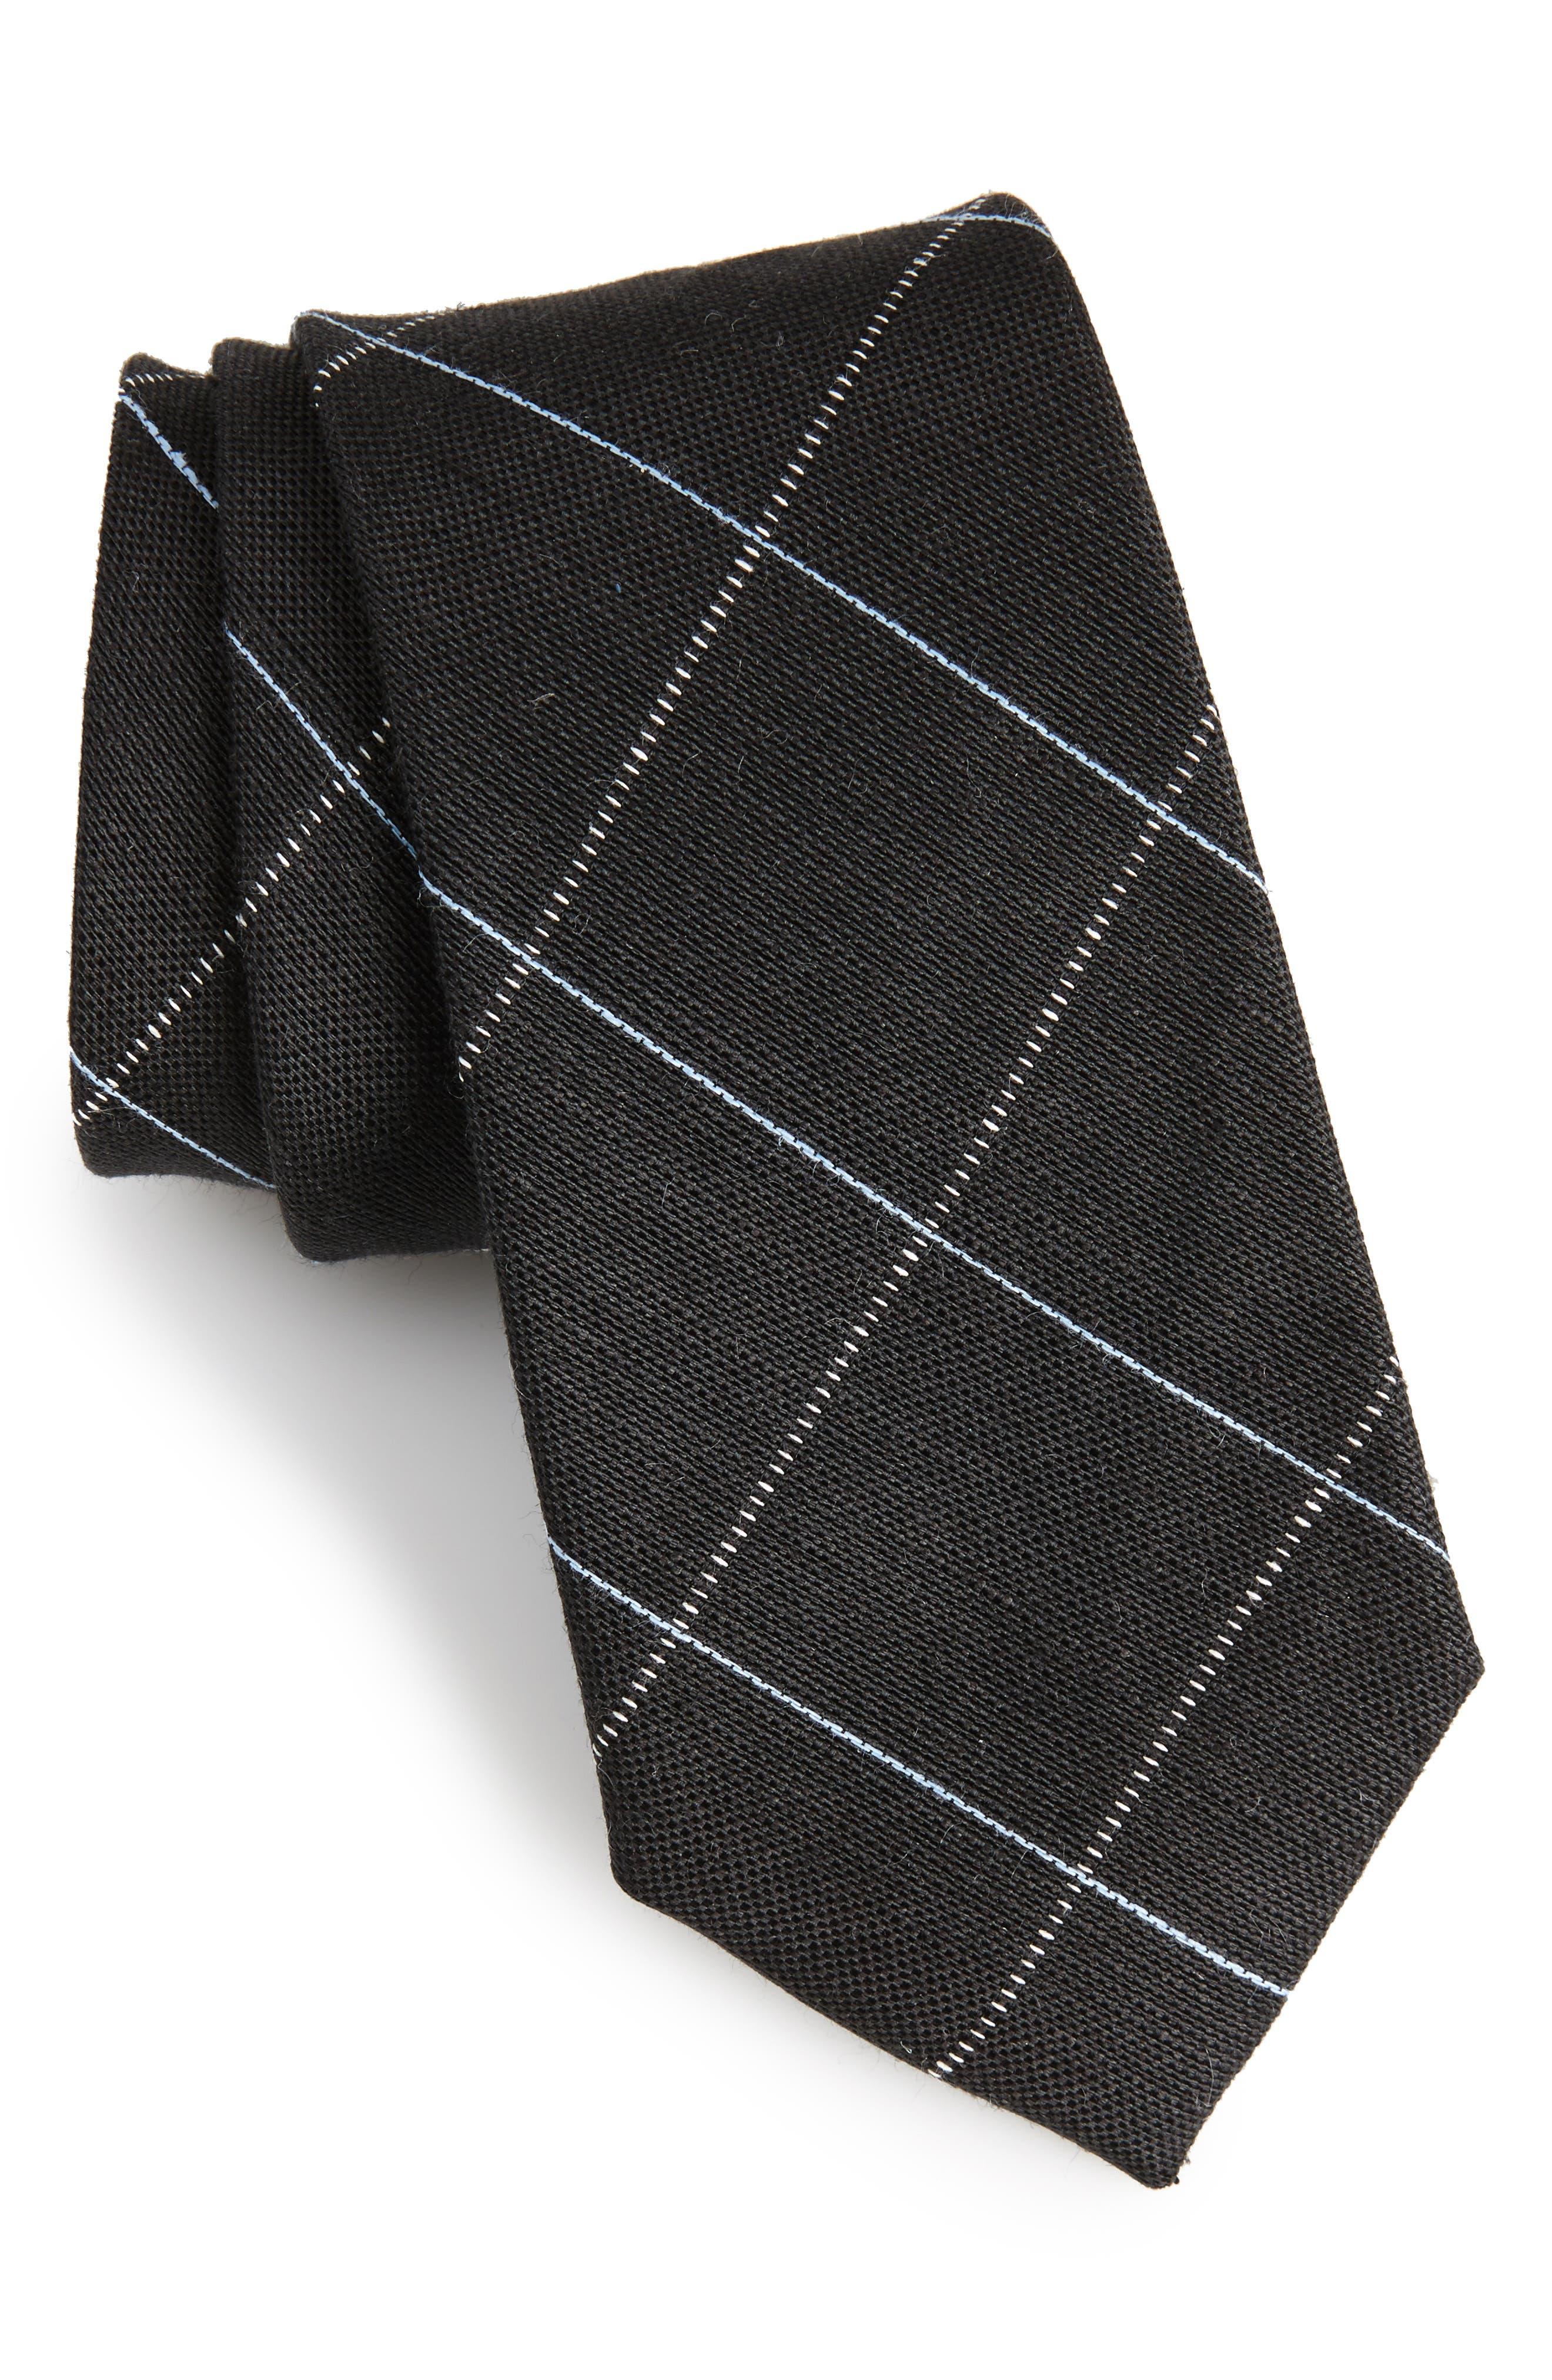 Alternate Image 1 Selected - Calibrate Candler Grid Linen & Silk Tie